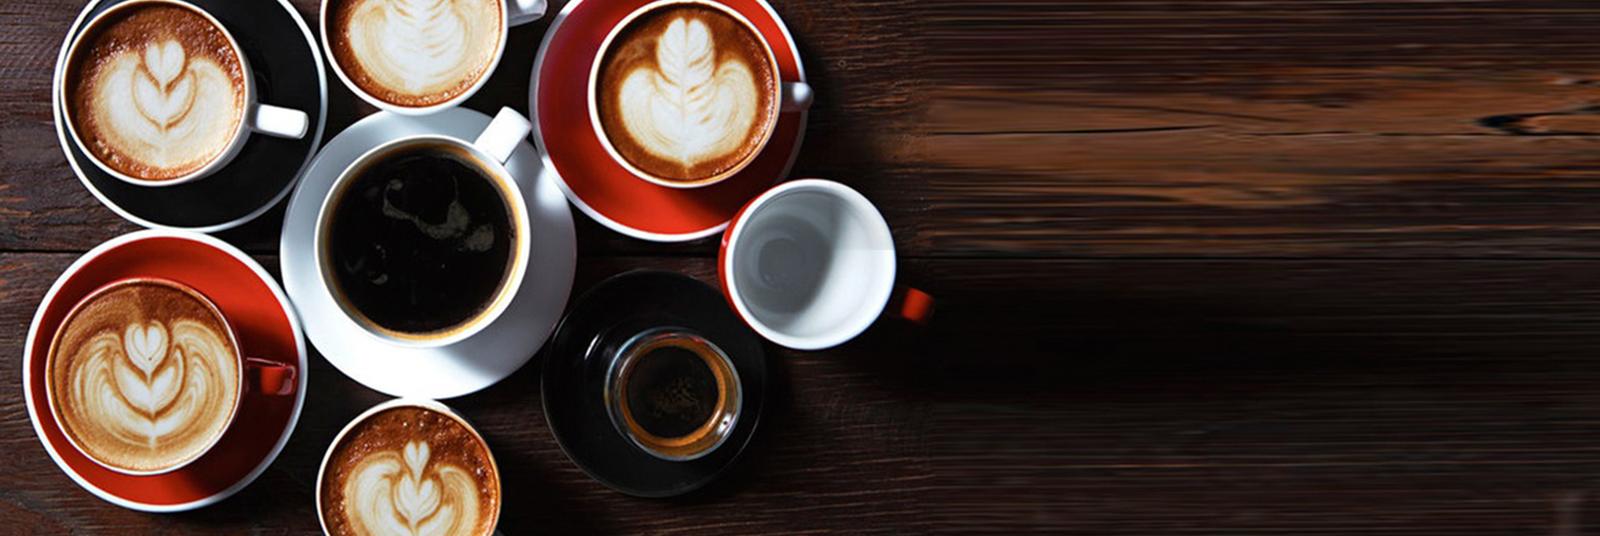 Passió de Cafè